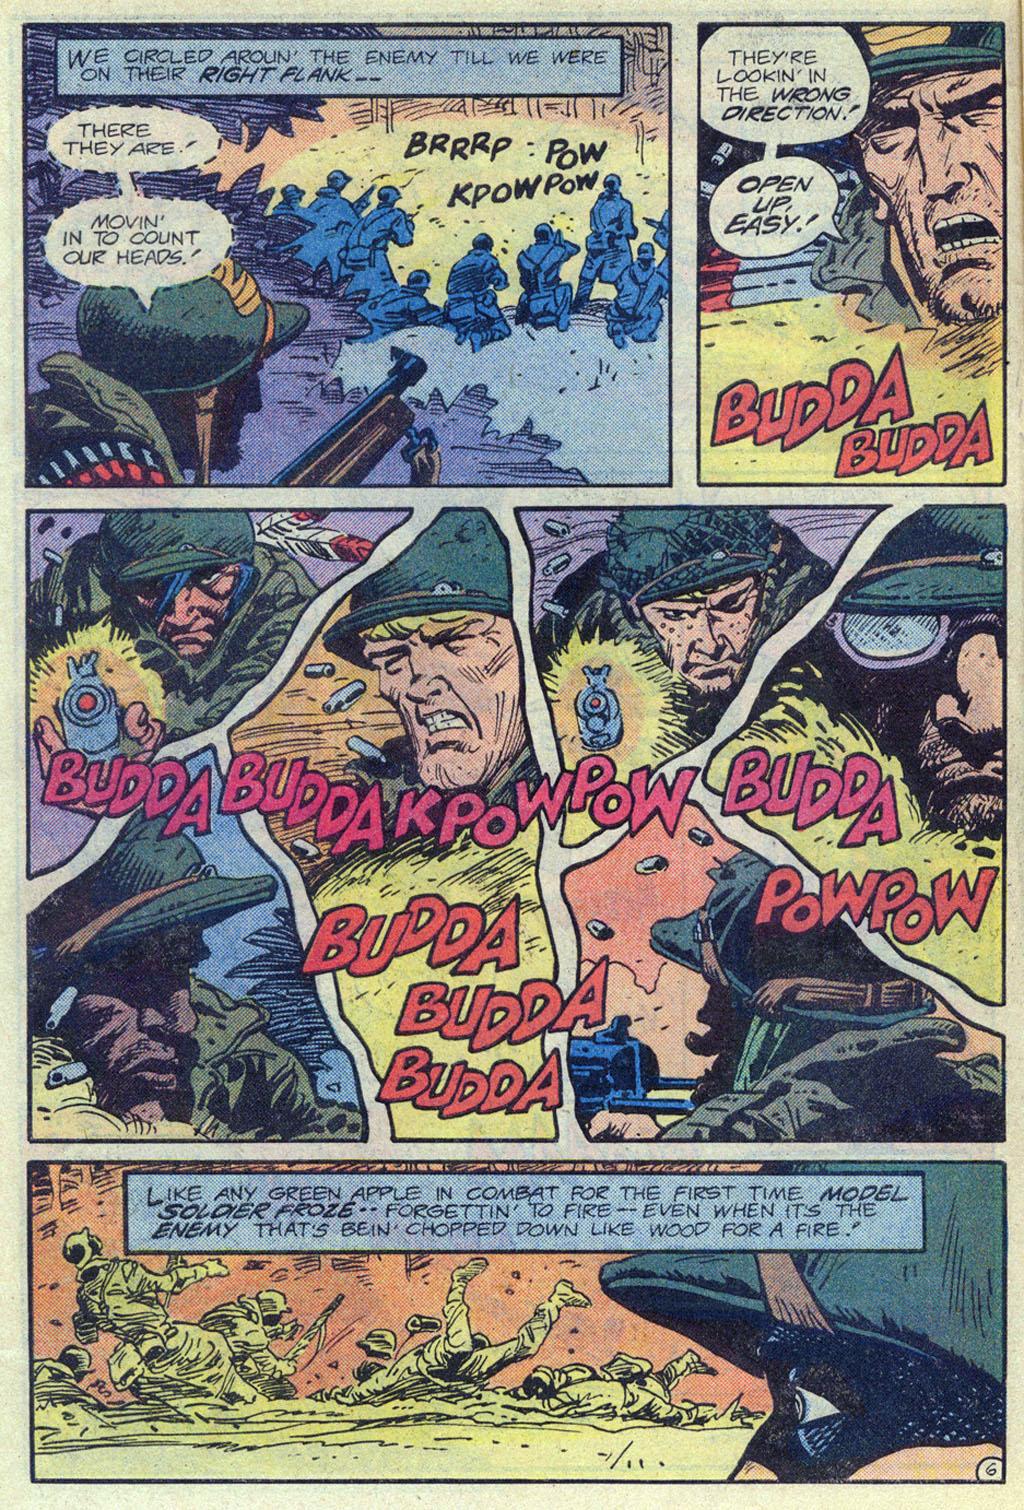 Read online Sgt. Rock comic -  Issue #369 - 6